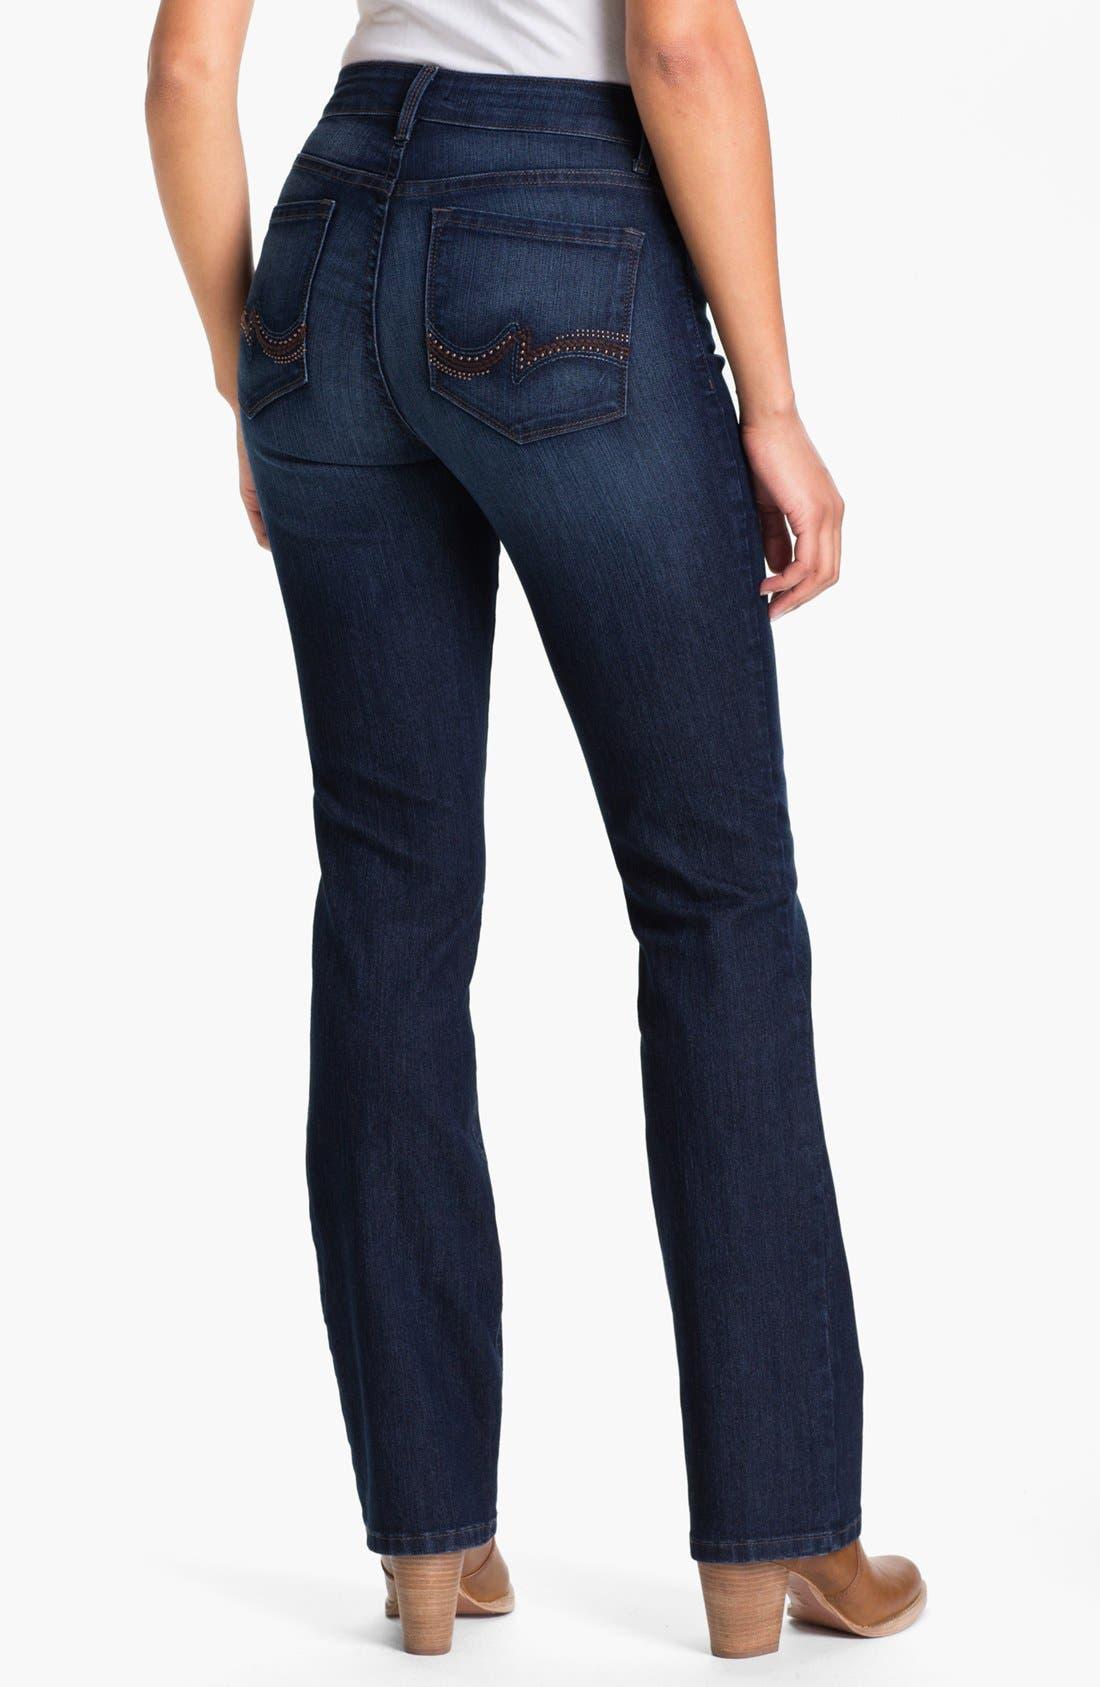 Alternate Image 2  - NYDJ 'Barbara' Embellished Bootcut Jeans (Petite)